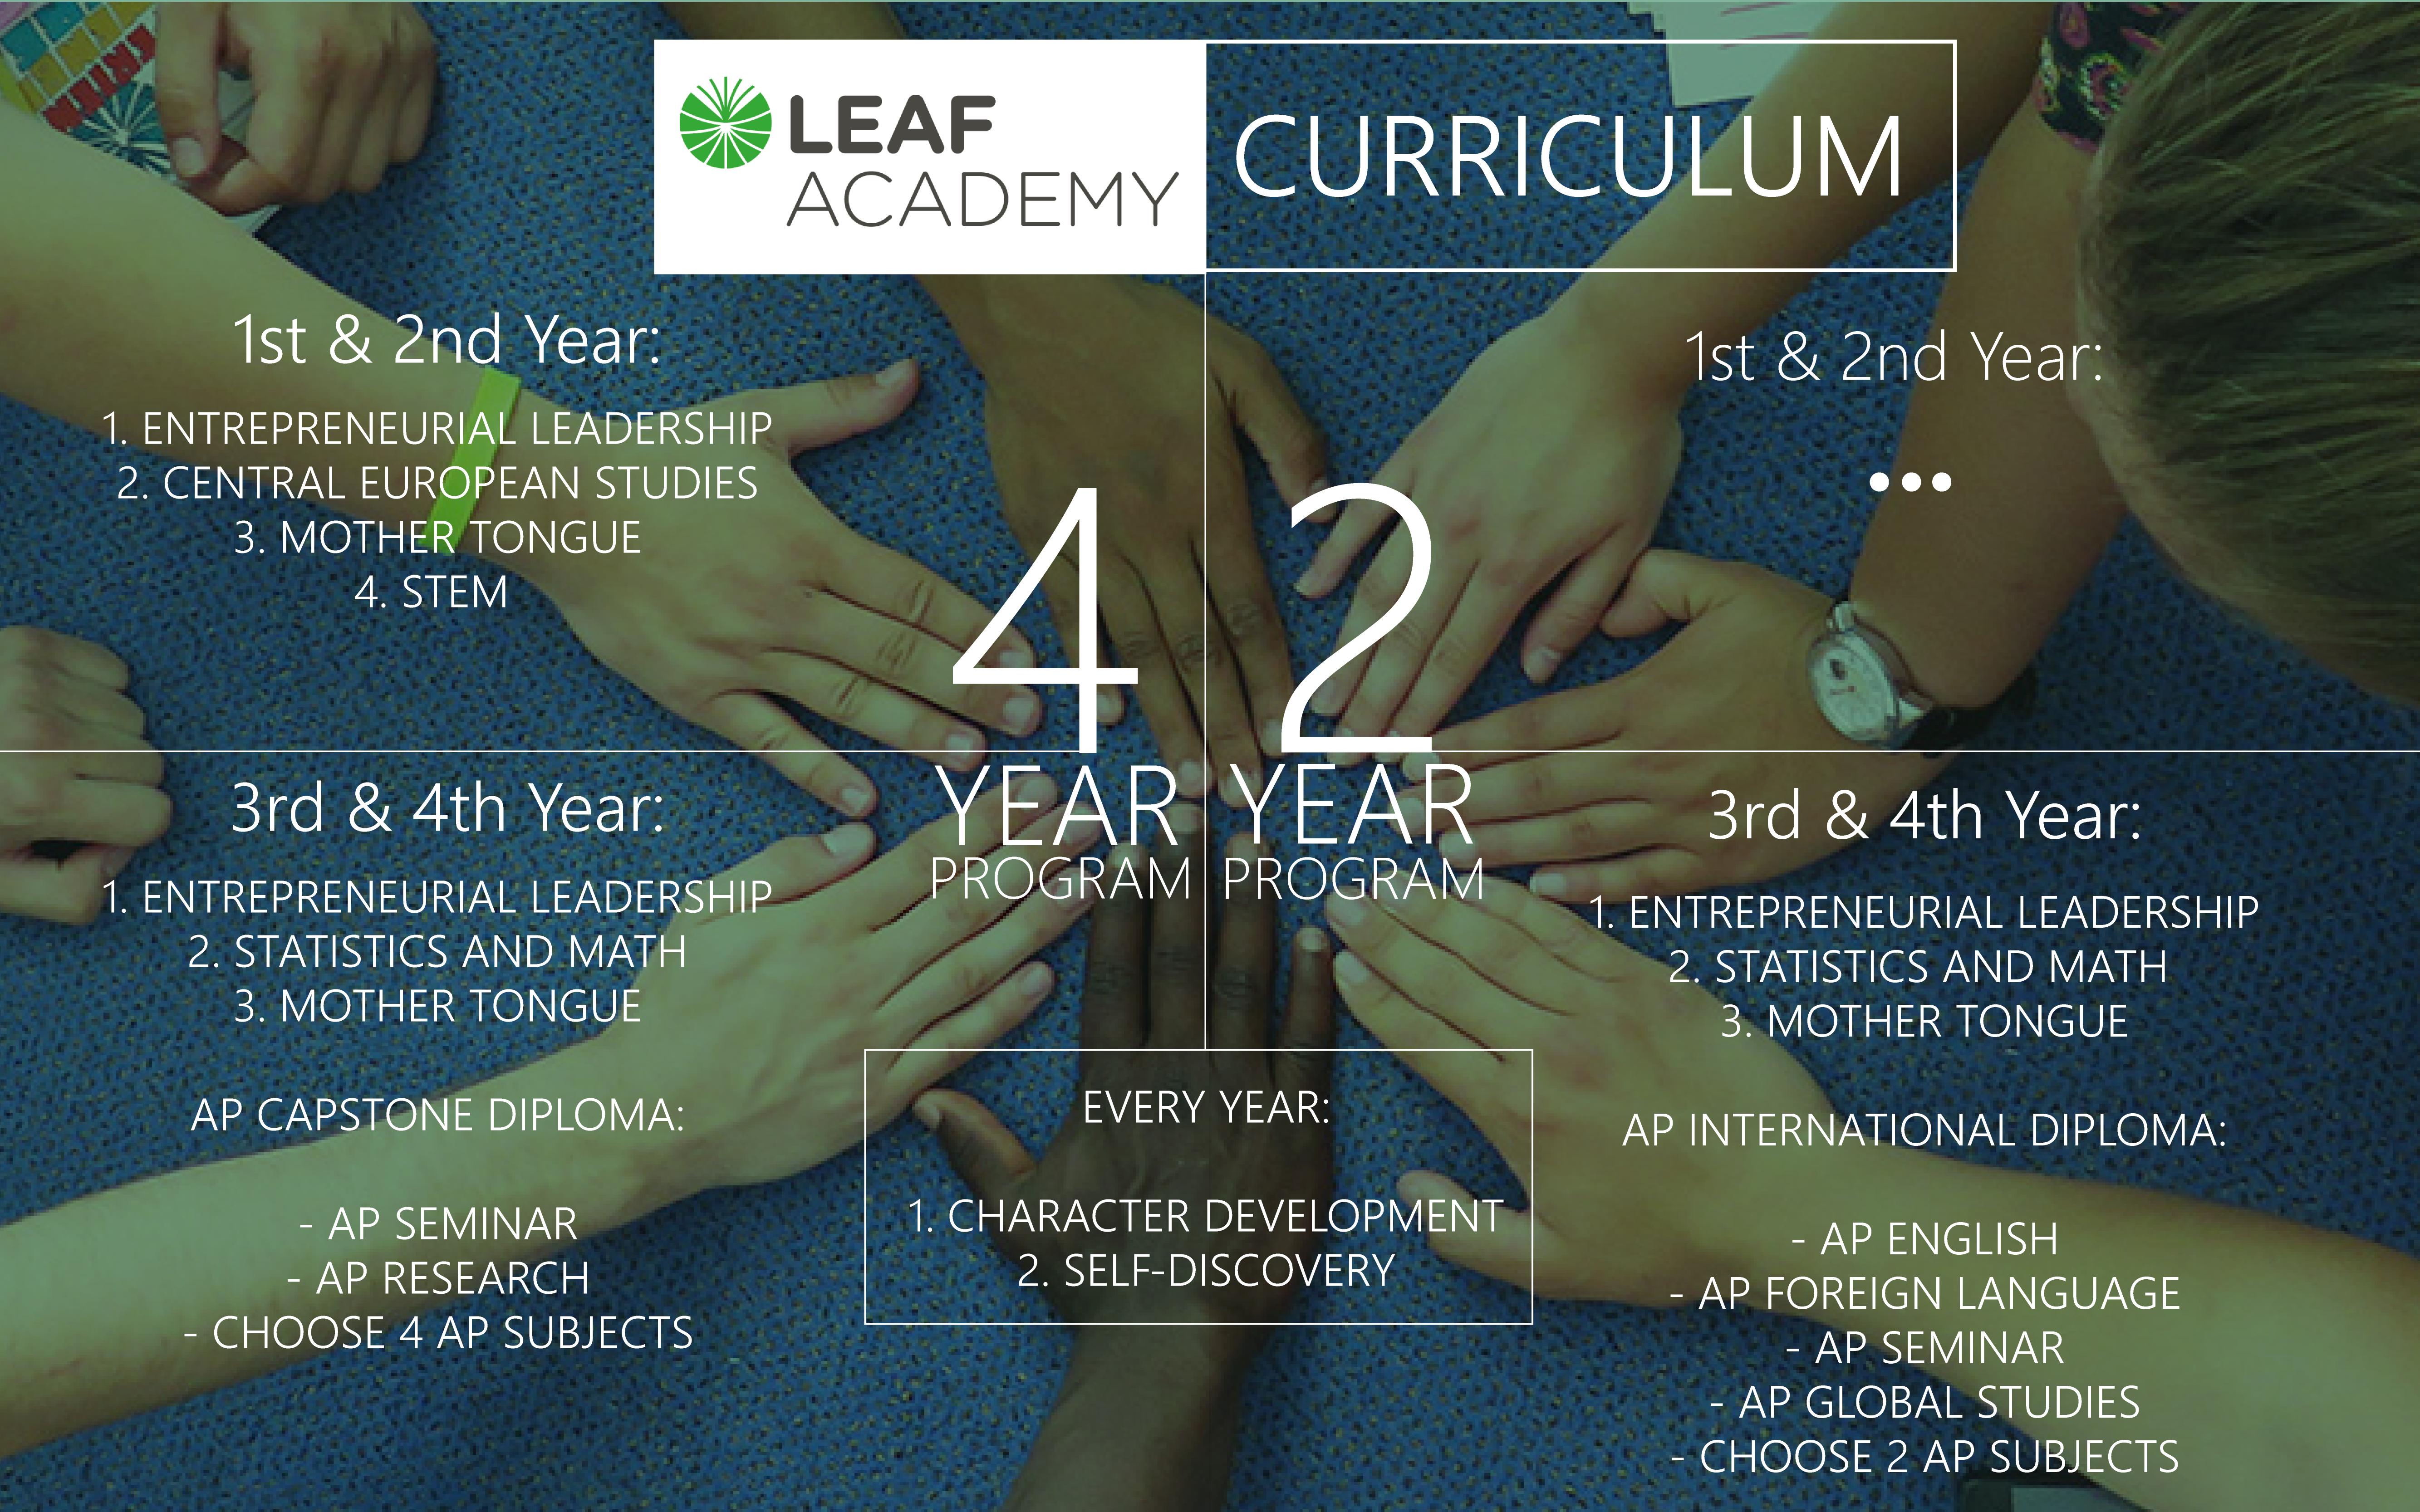 Curriculum of the LEAF Academy hign school